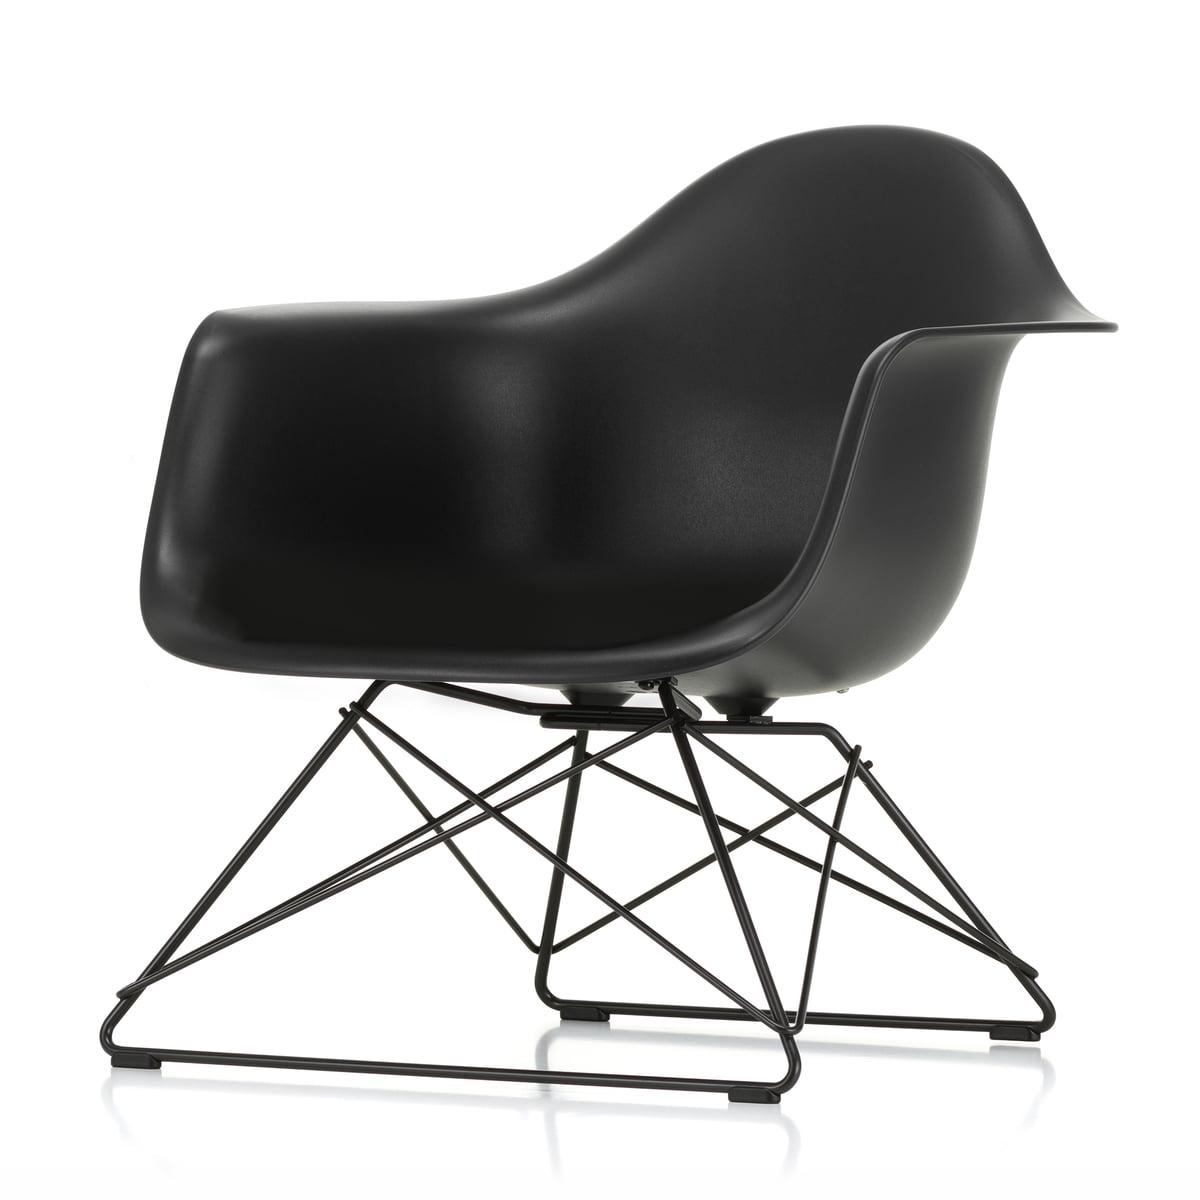 Vitra Eames plastic fauteuil lar, basic dark diep zwart (viltglijders basic dark)